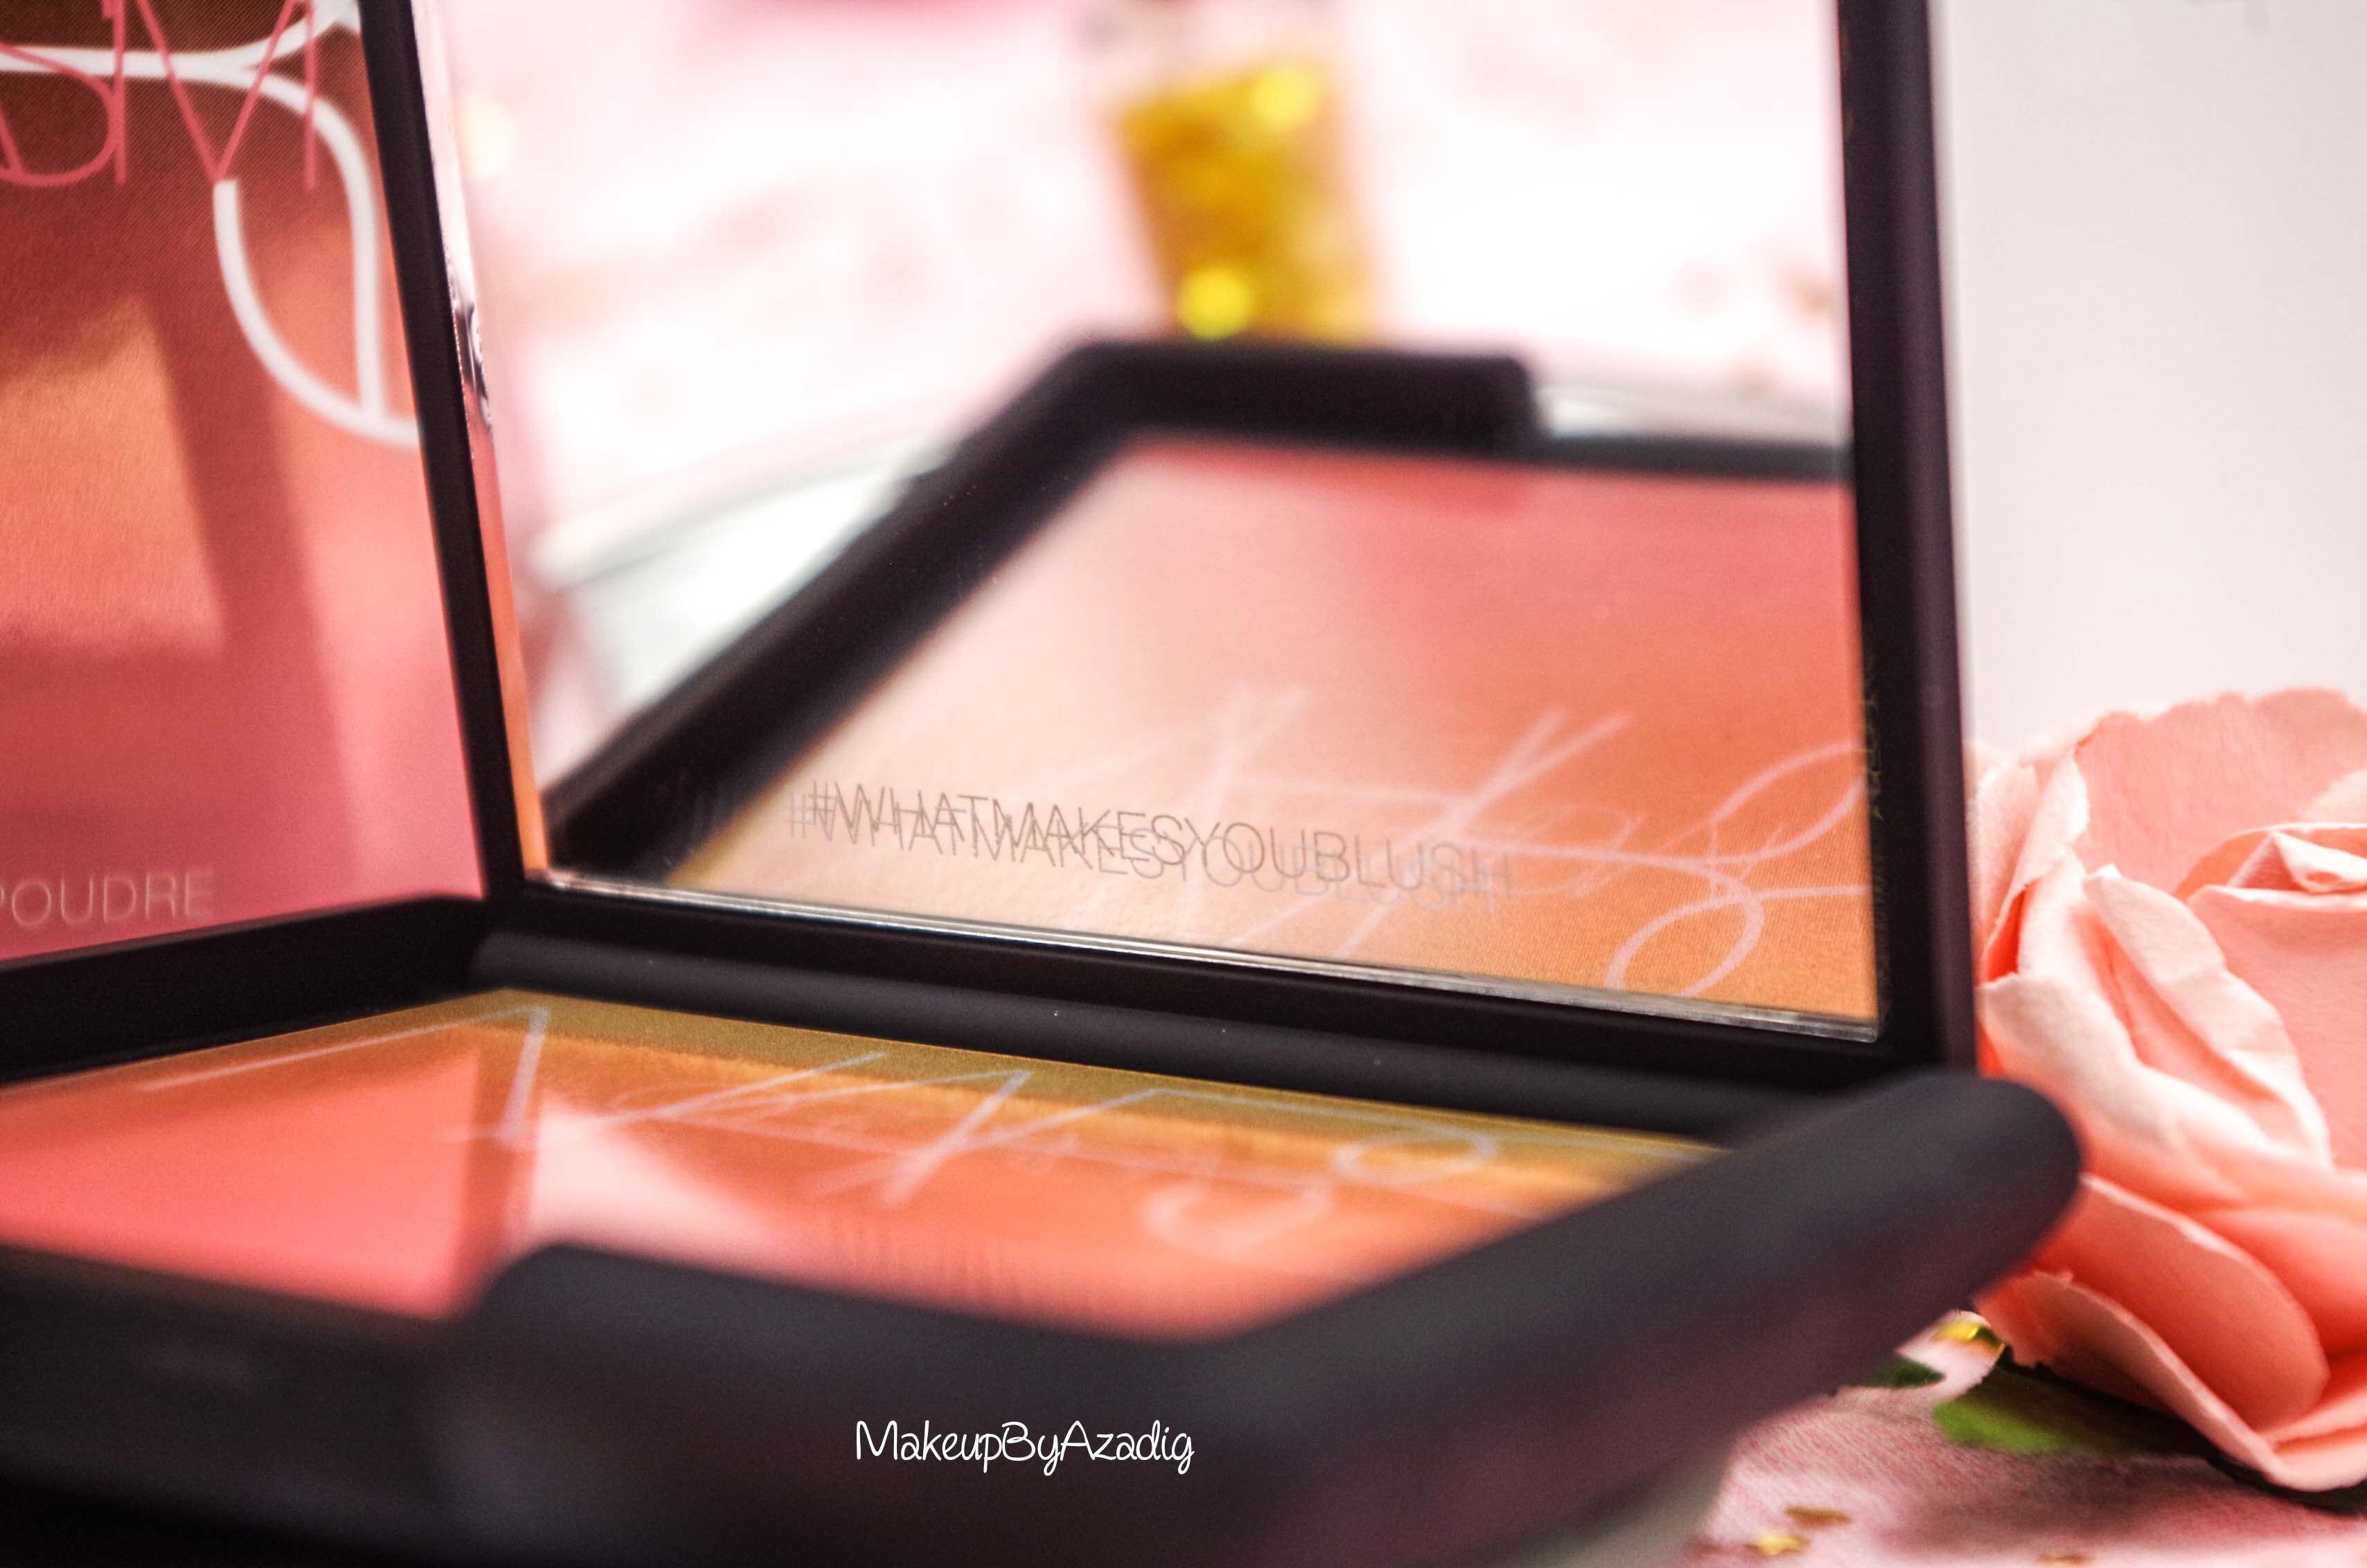 blush-liquide-orgasm-rouge-a-levres-illuminateur-highlighter-rosegold-nars-miroir-makeupbyazadig